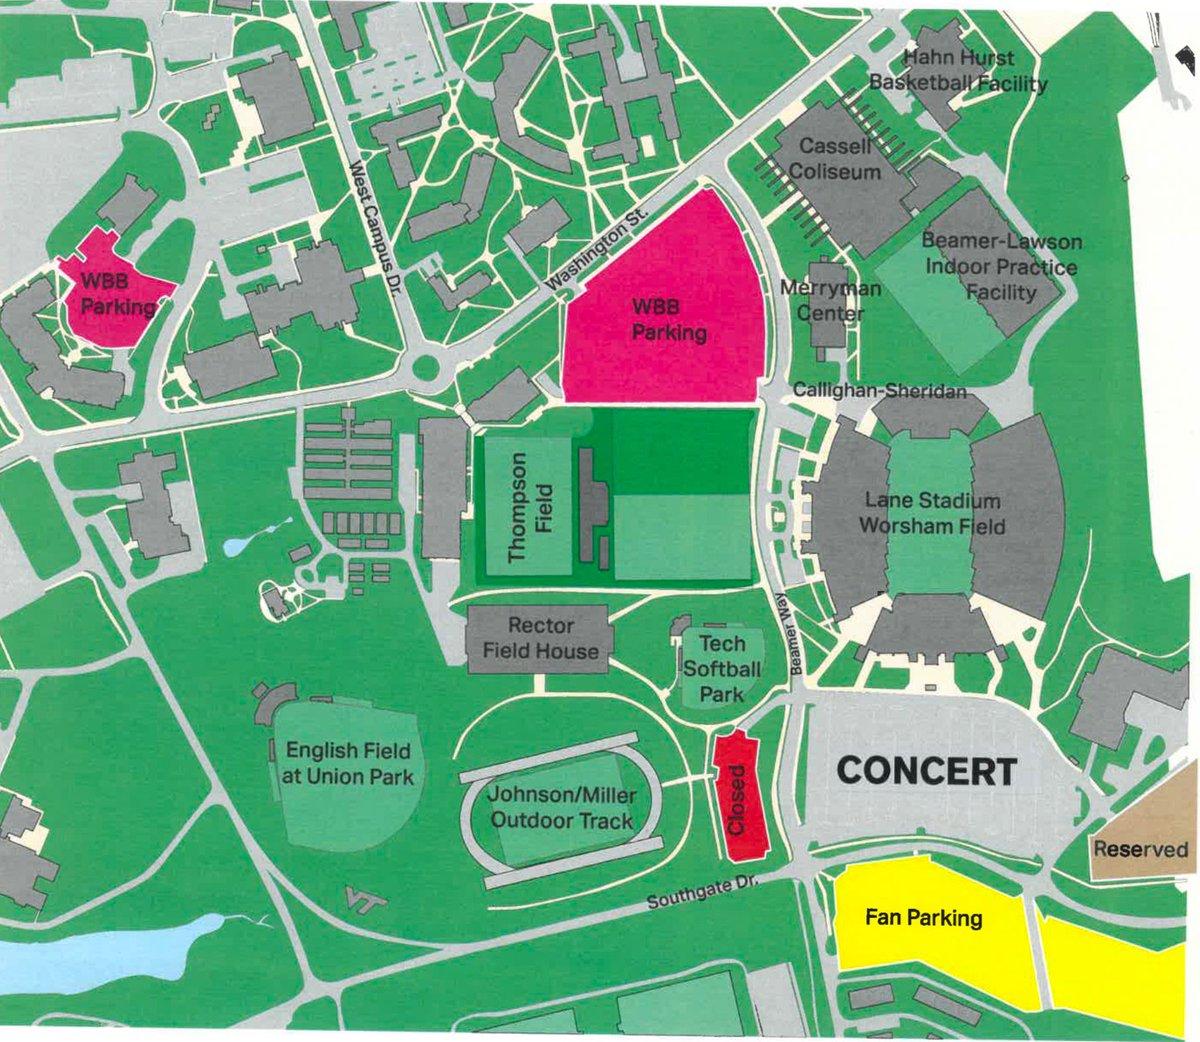 Virginia Tech Campus Map Parking Www Topsimages Com